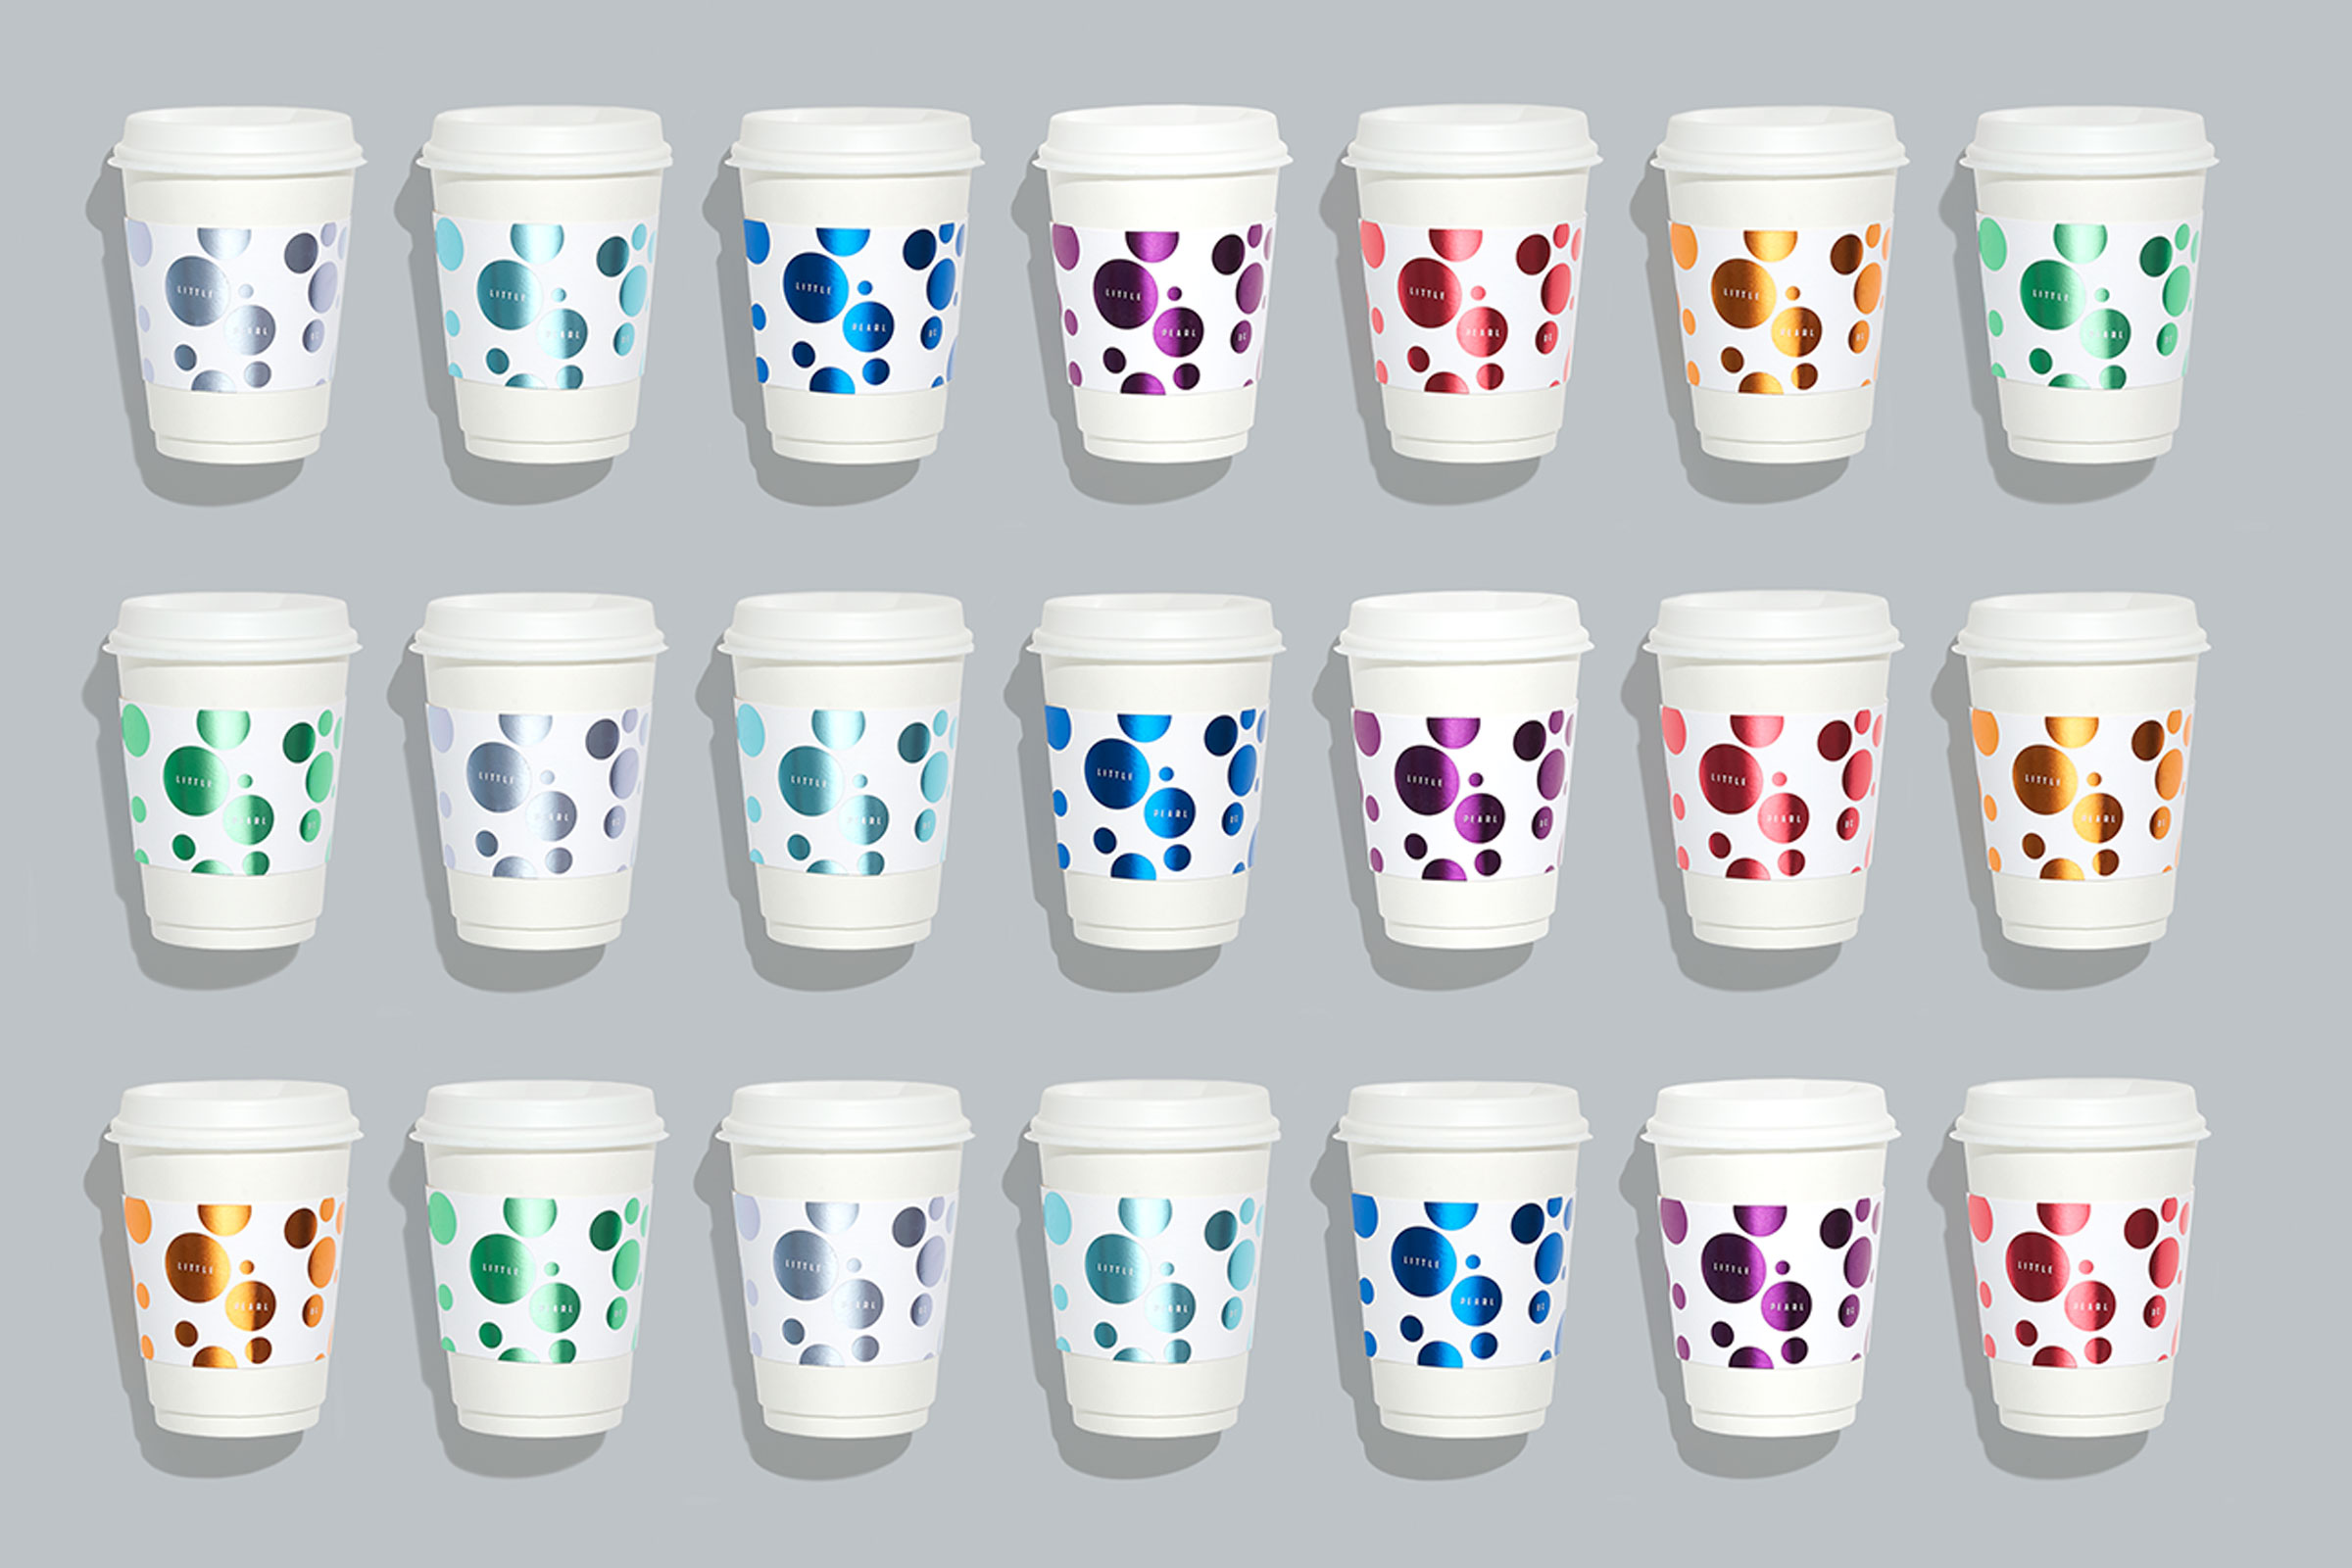 04_LittlePearl_CoffeeSleevesColors_2400